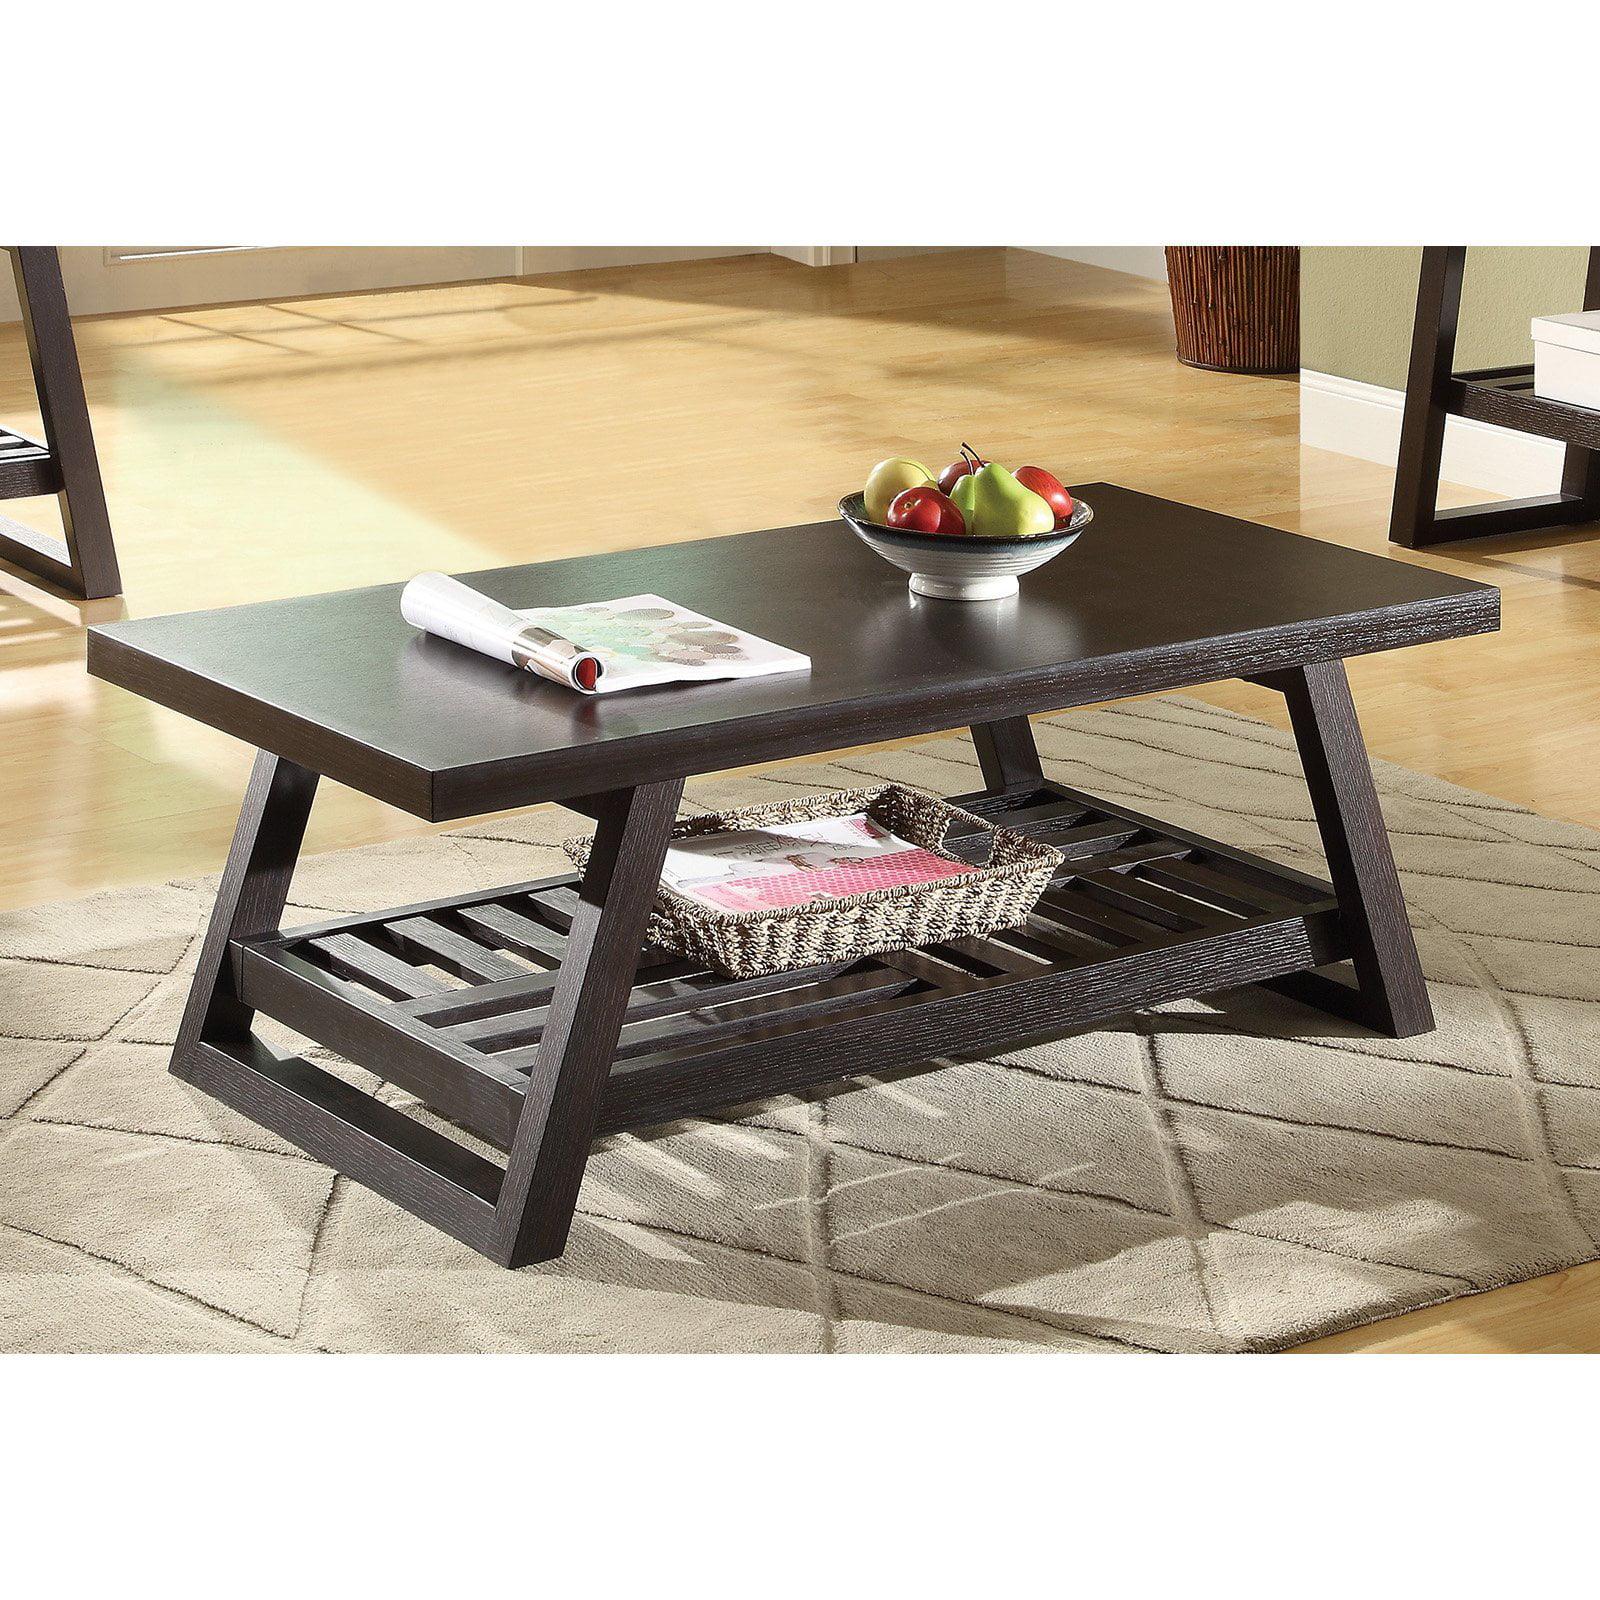 Coaster Furniture Wood Coffee Table with Shelf